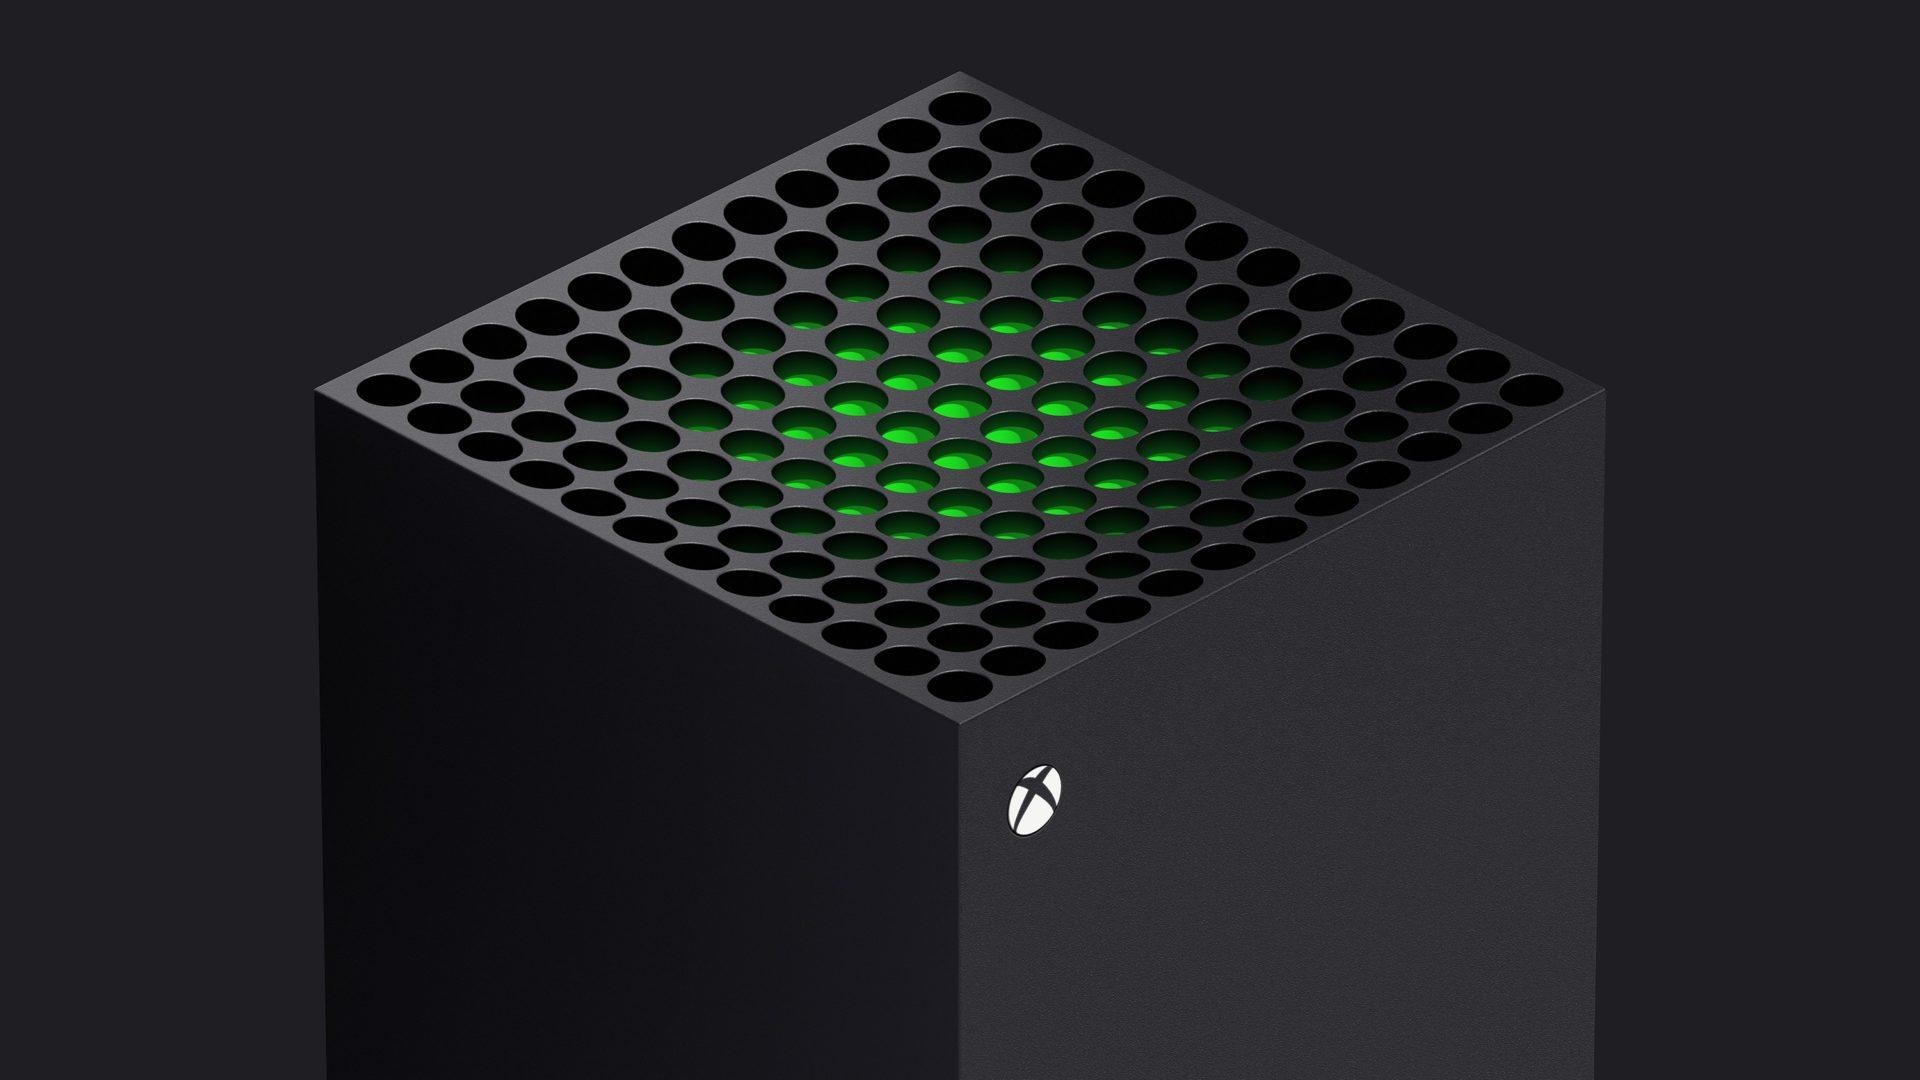 Xbox Series X fans